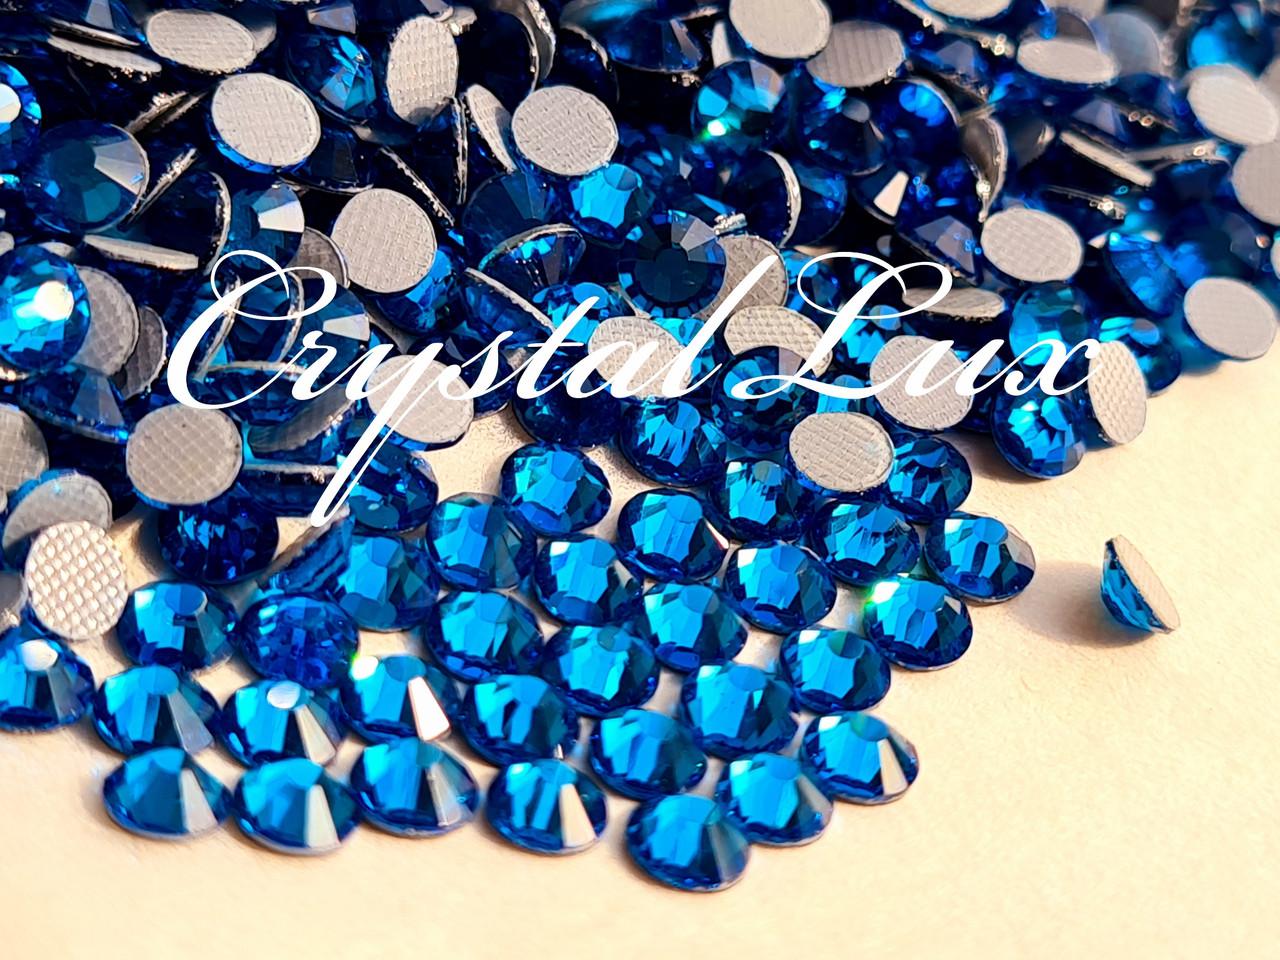 Термо стразы Lux ss16 Capri Blue (4.0mm) 1440шт